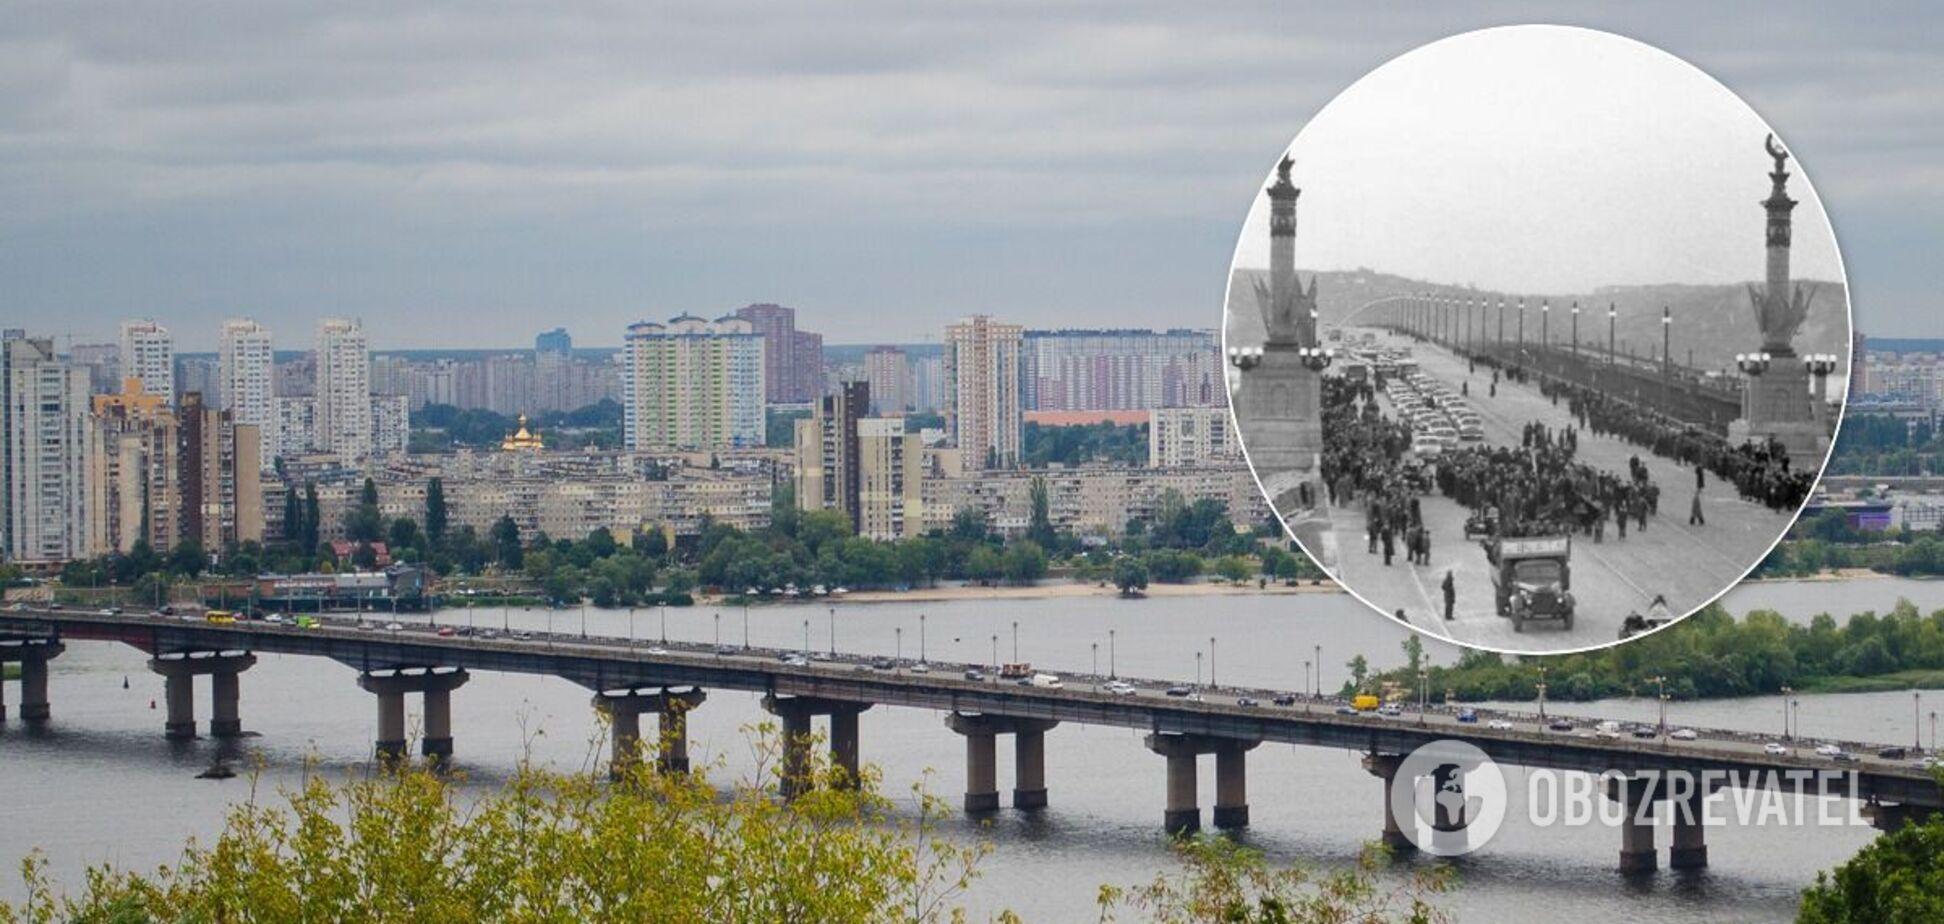 Рух мостом Патона відкрито 5 листопада 1953 року